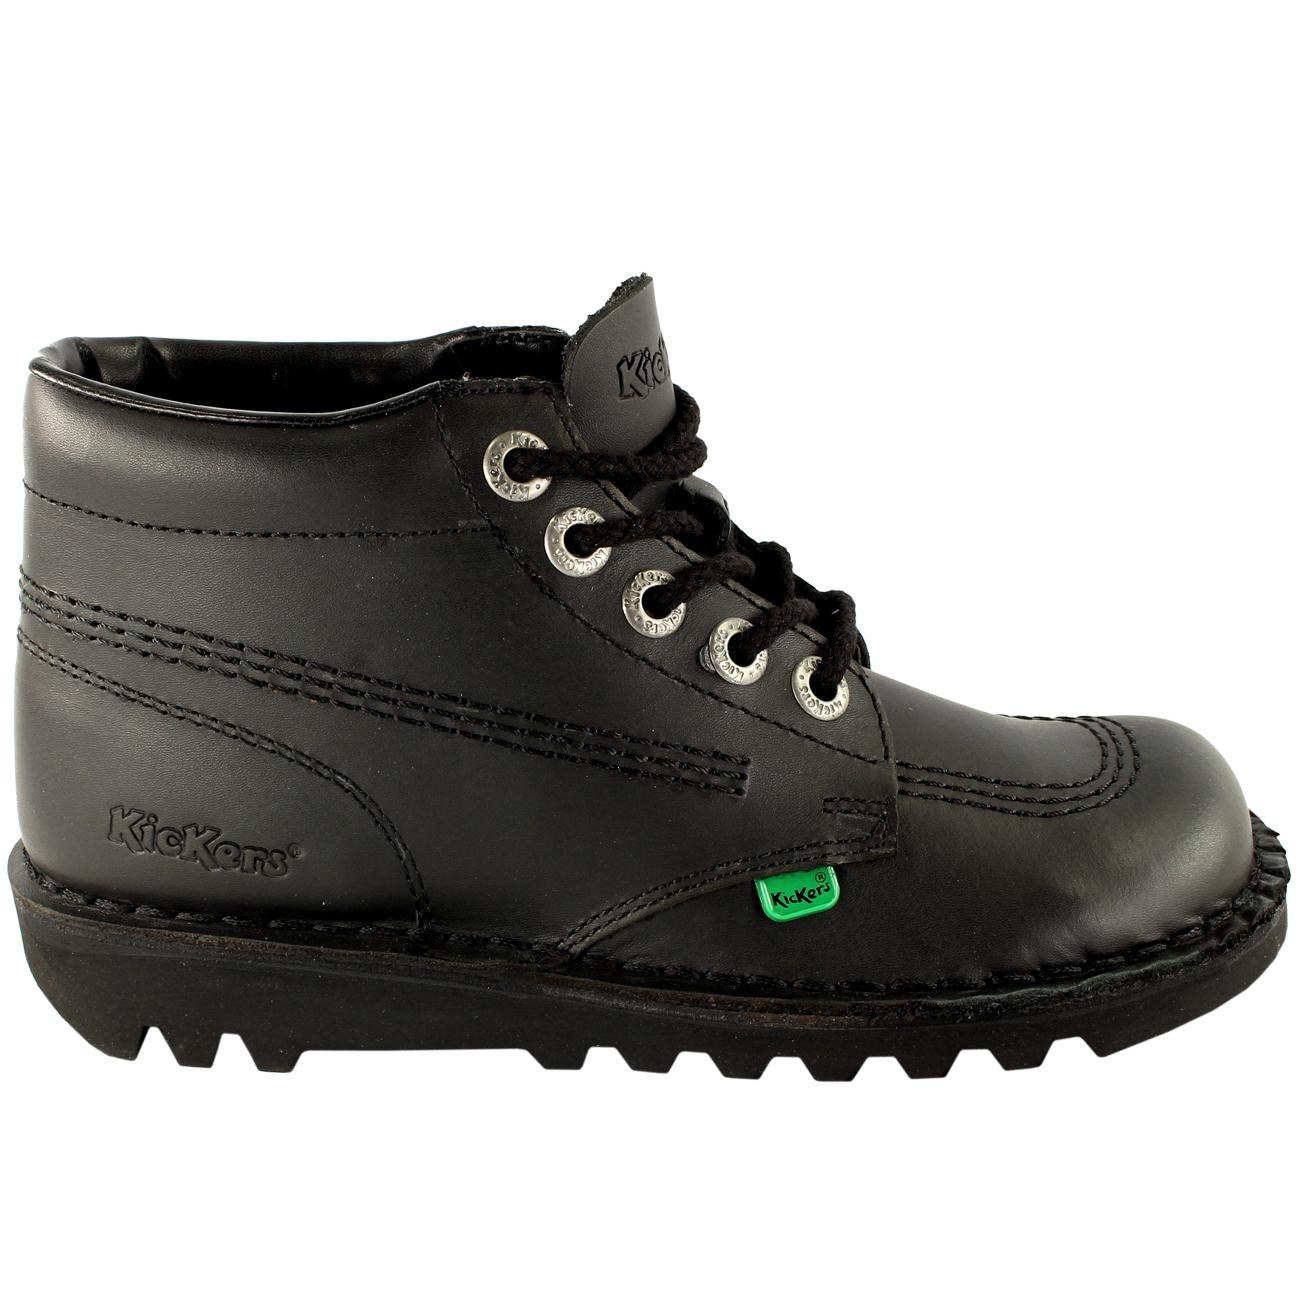 Black kicker sandals - Mens Kickers Kick Hi Leather Classic Oxfords Office